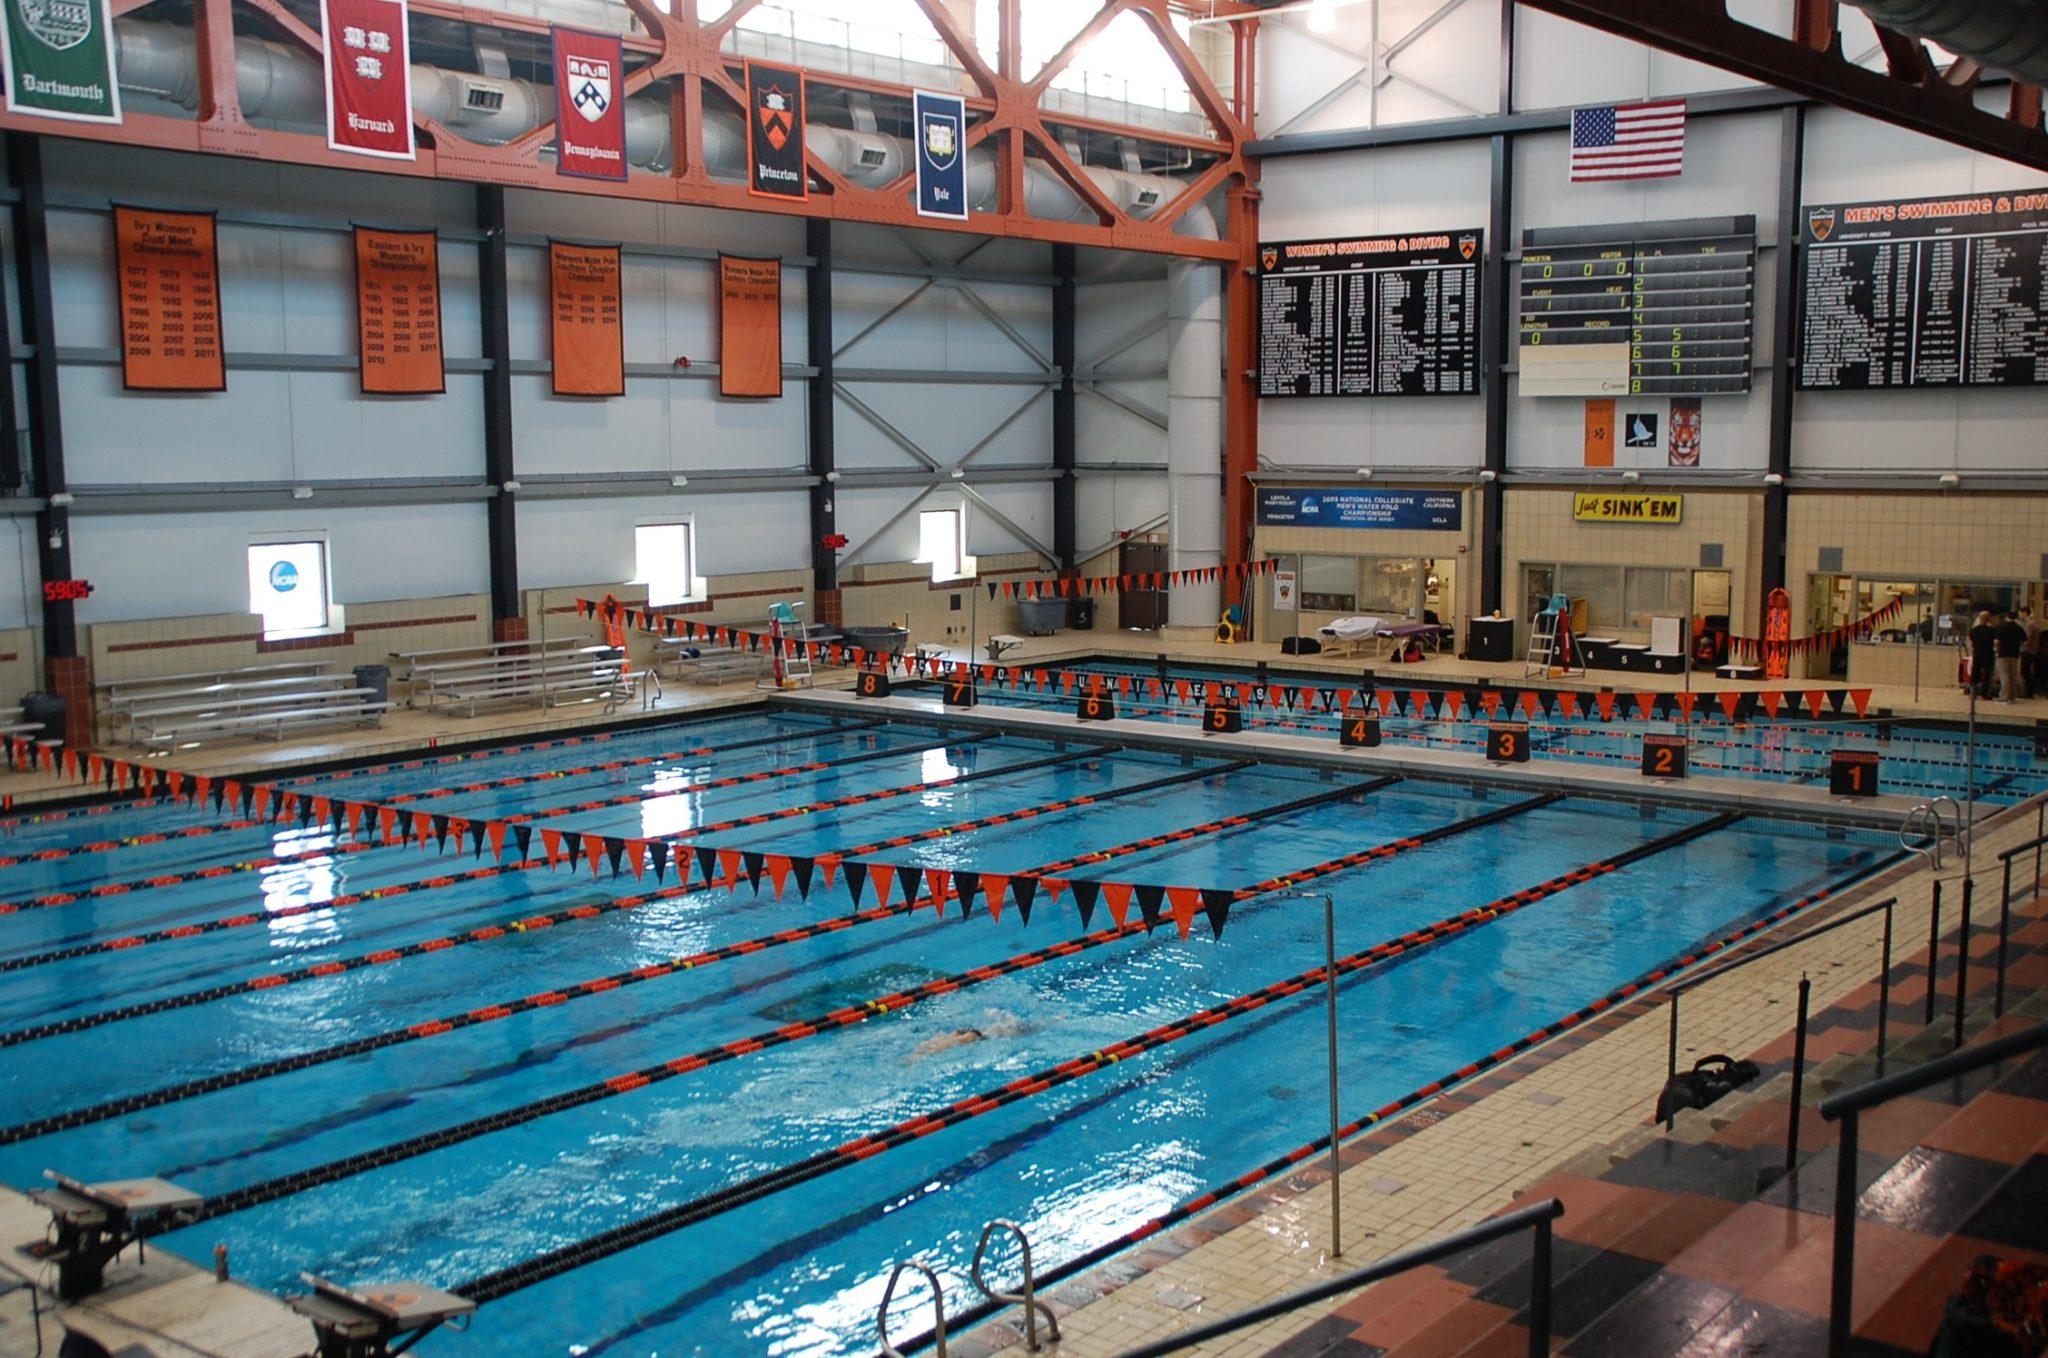 Princeton suspends men 39 s swimming and diving team 39 s season - Princeton university swimming pool ...